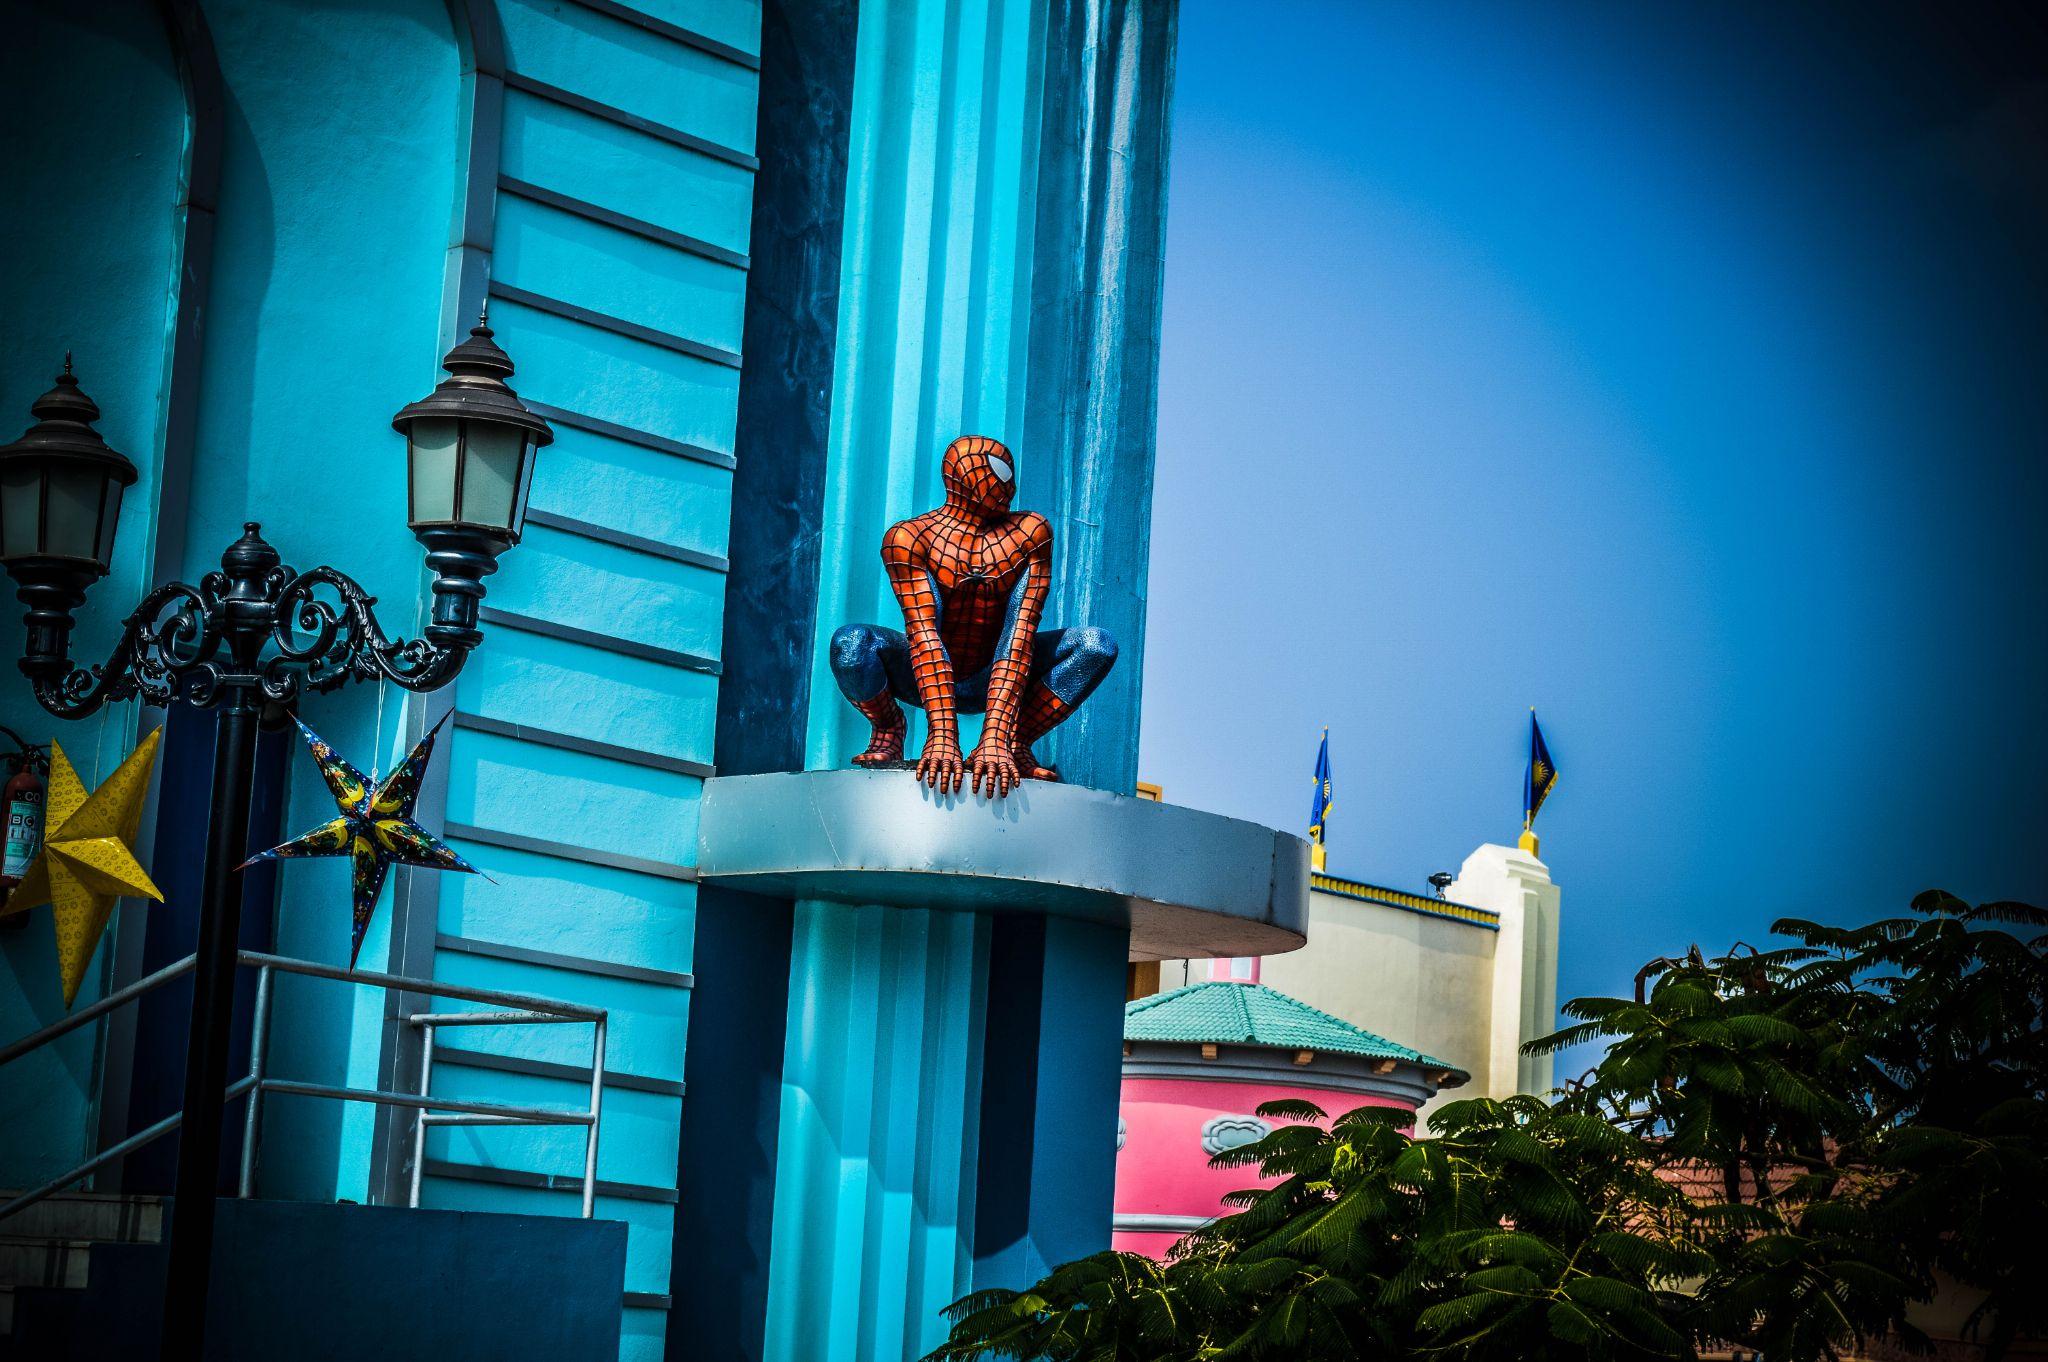 SpiderMan by Chetan Kumar